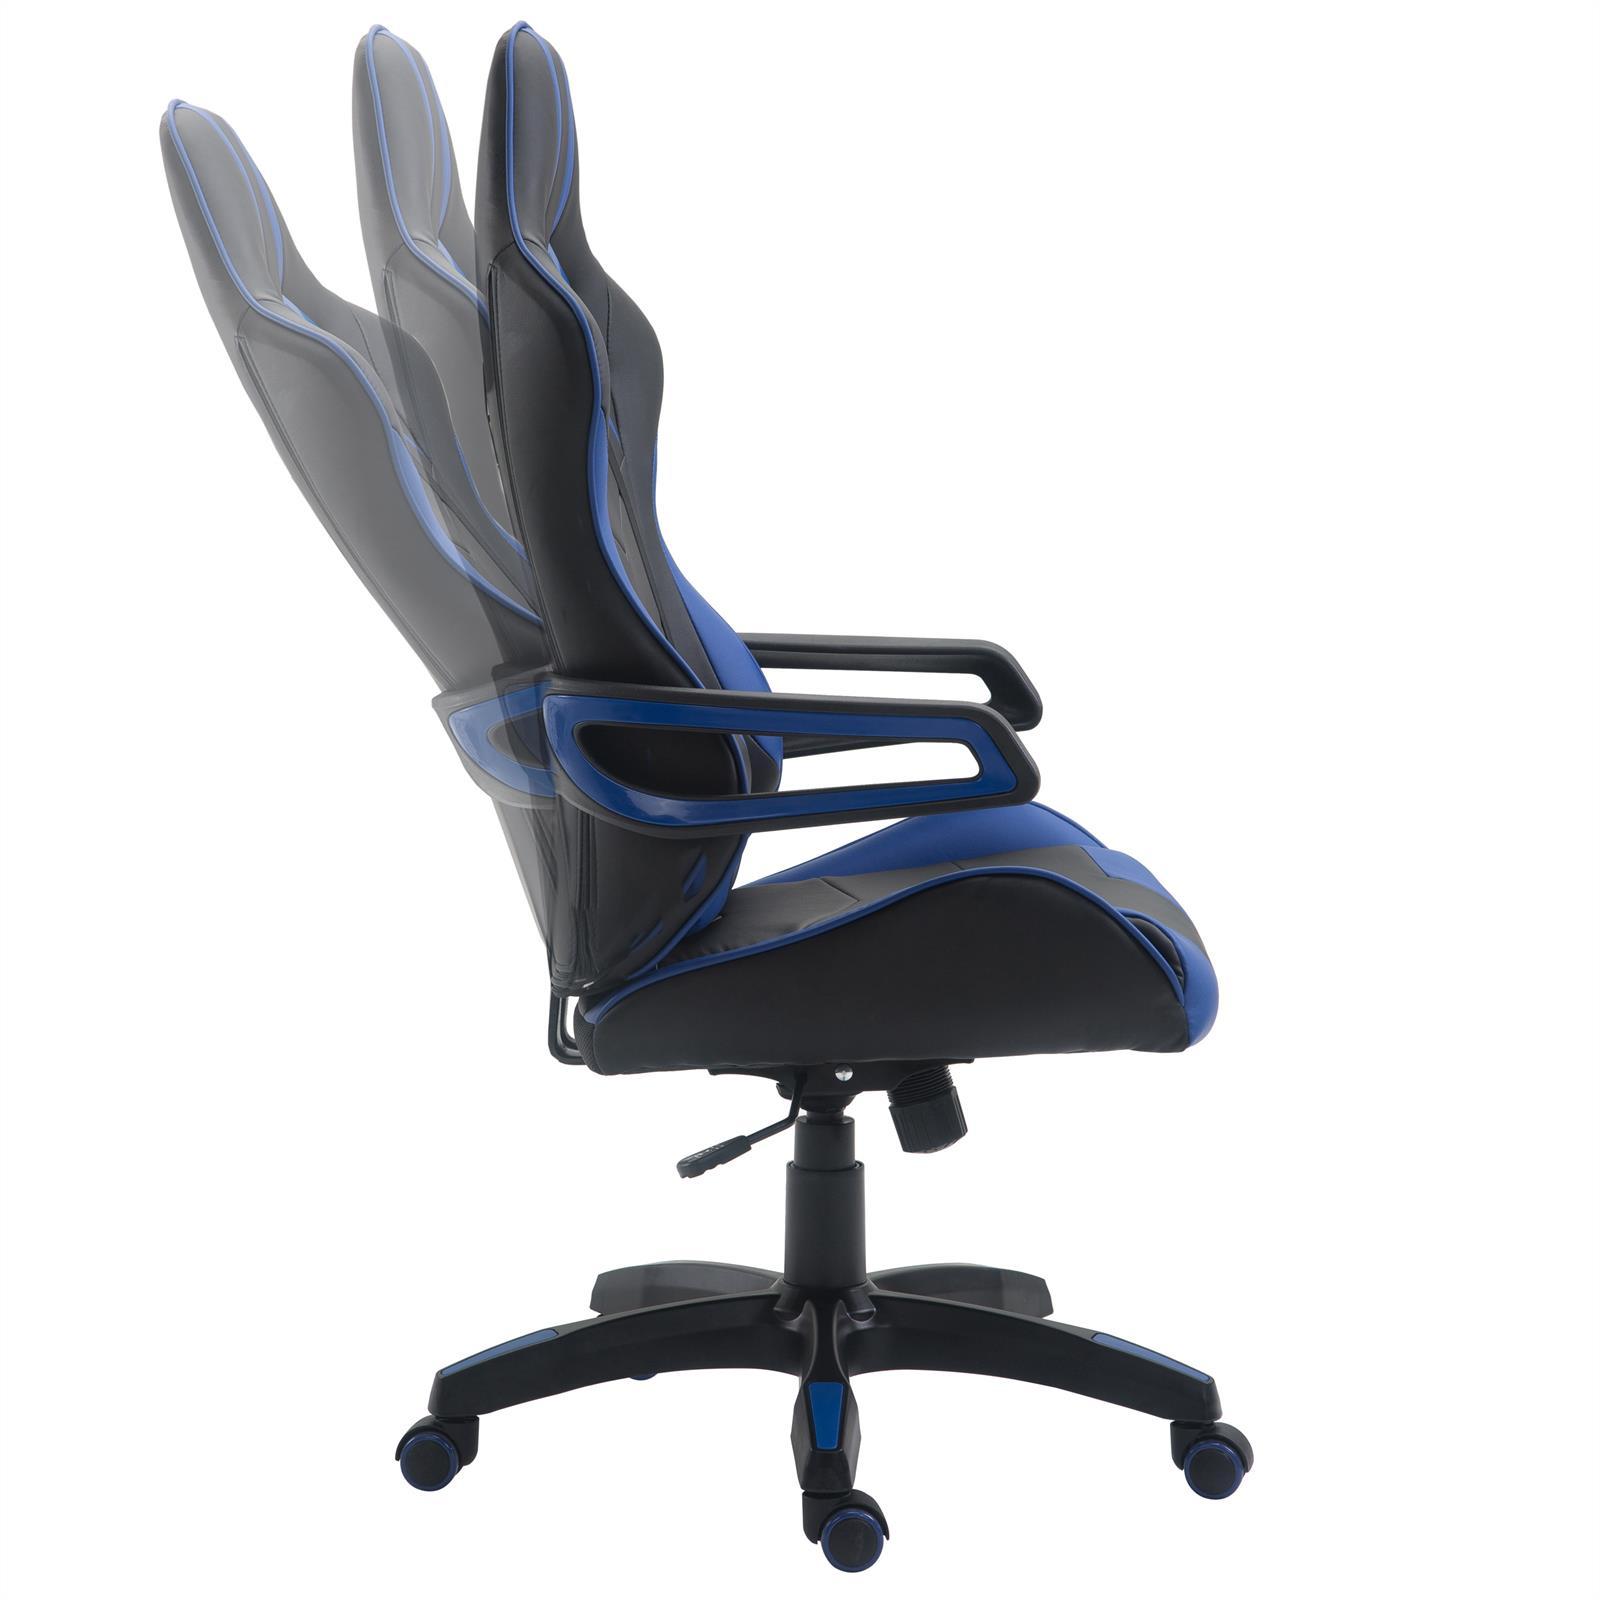 b rostuhl gaming stuhl racer drehstuhl chefsessel schreibtischstuhl gamer ebay. Black Bedroom Furniture Sets. Home Design Ideas